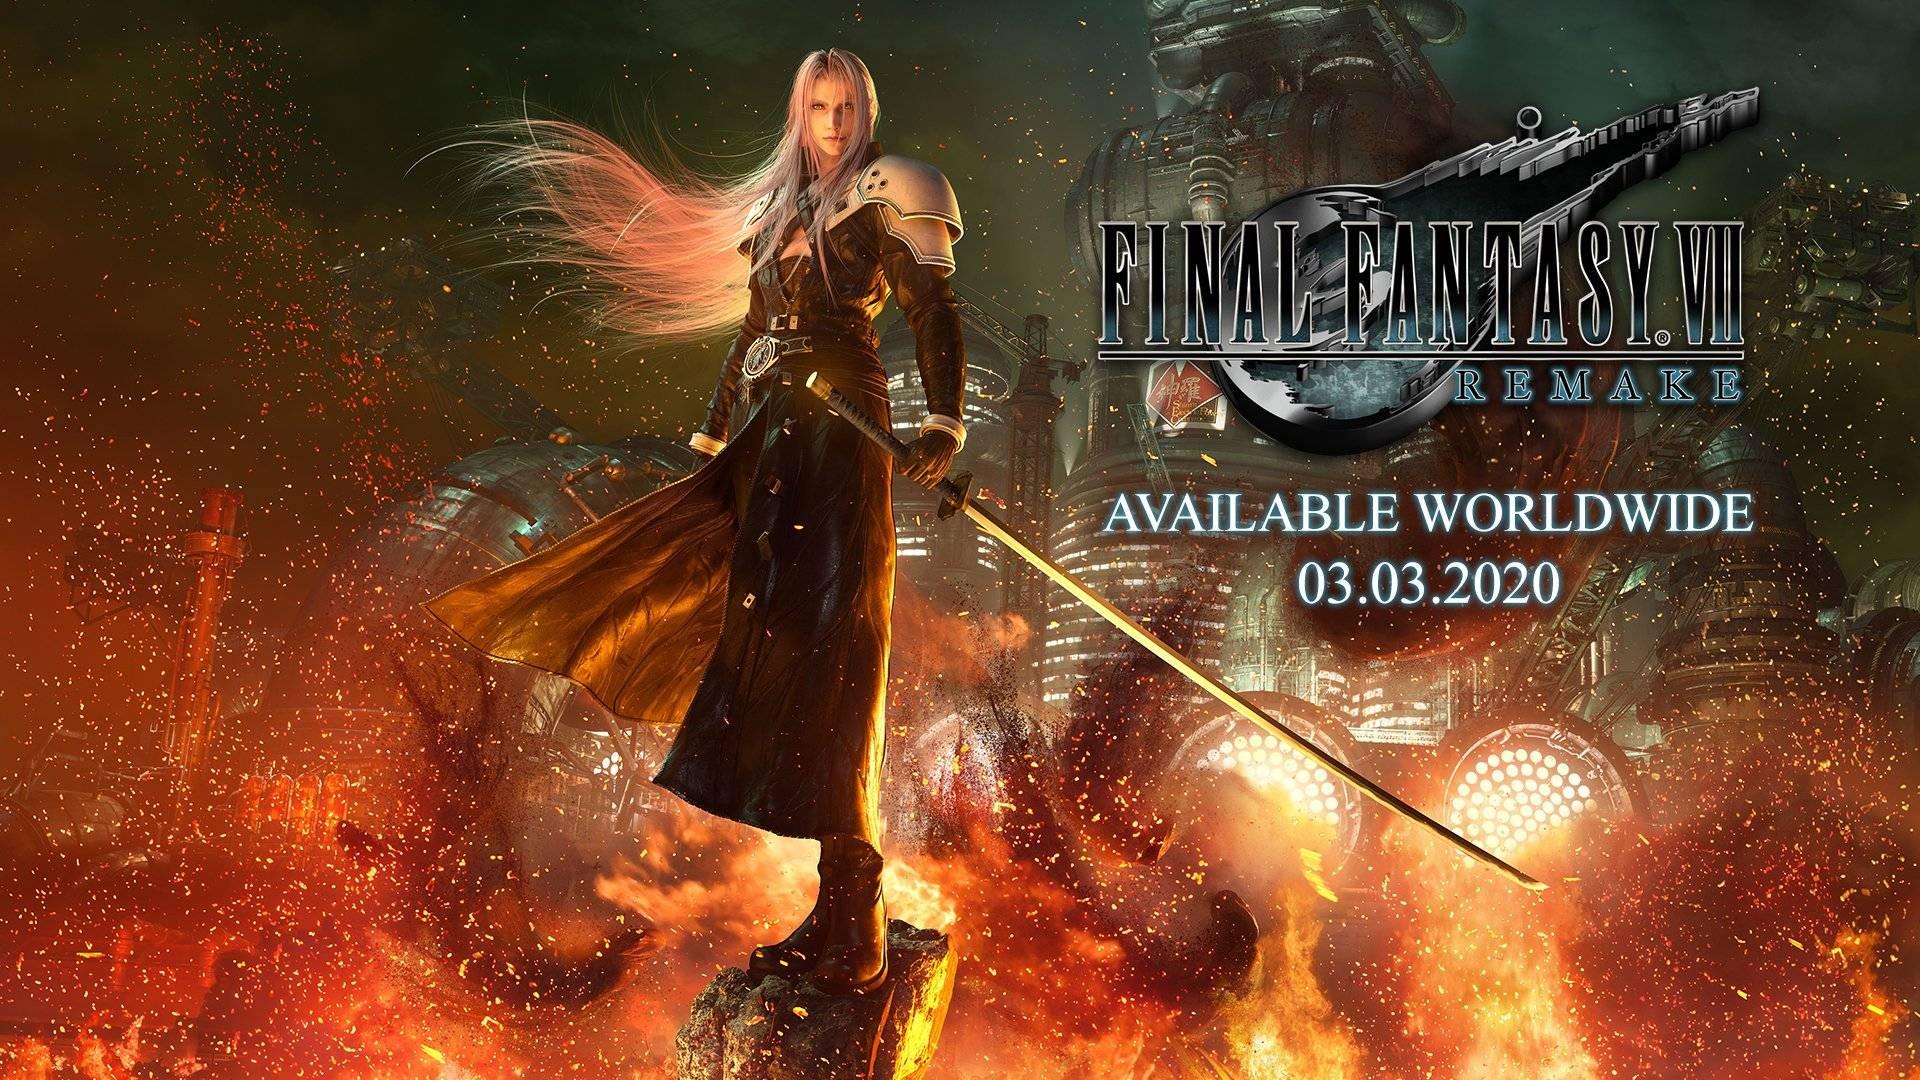 Square Enix представила трейлер ремейка Final Fantasy VII и объявила дату выхода — 3 марта 2020-го